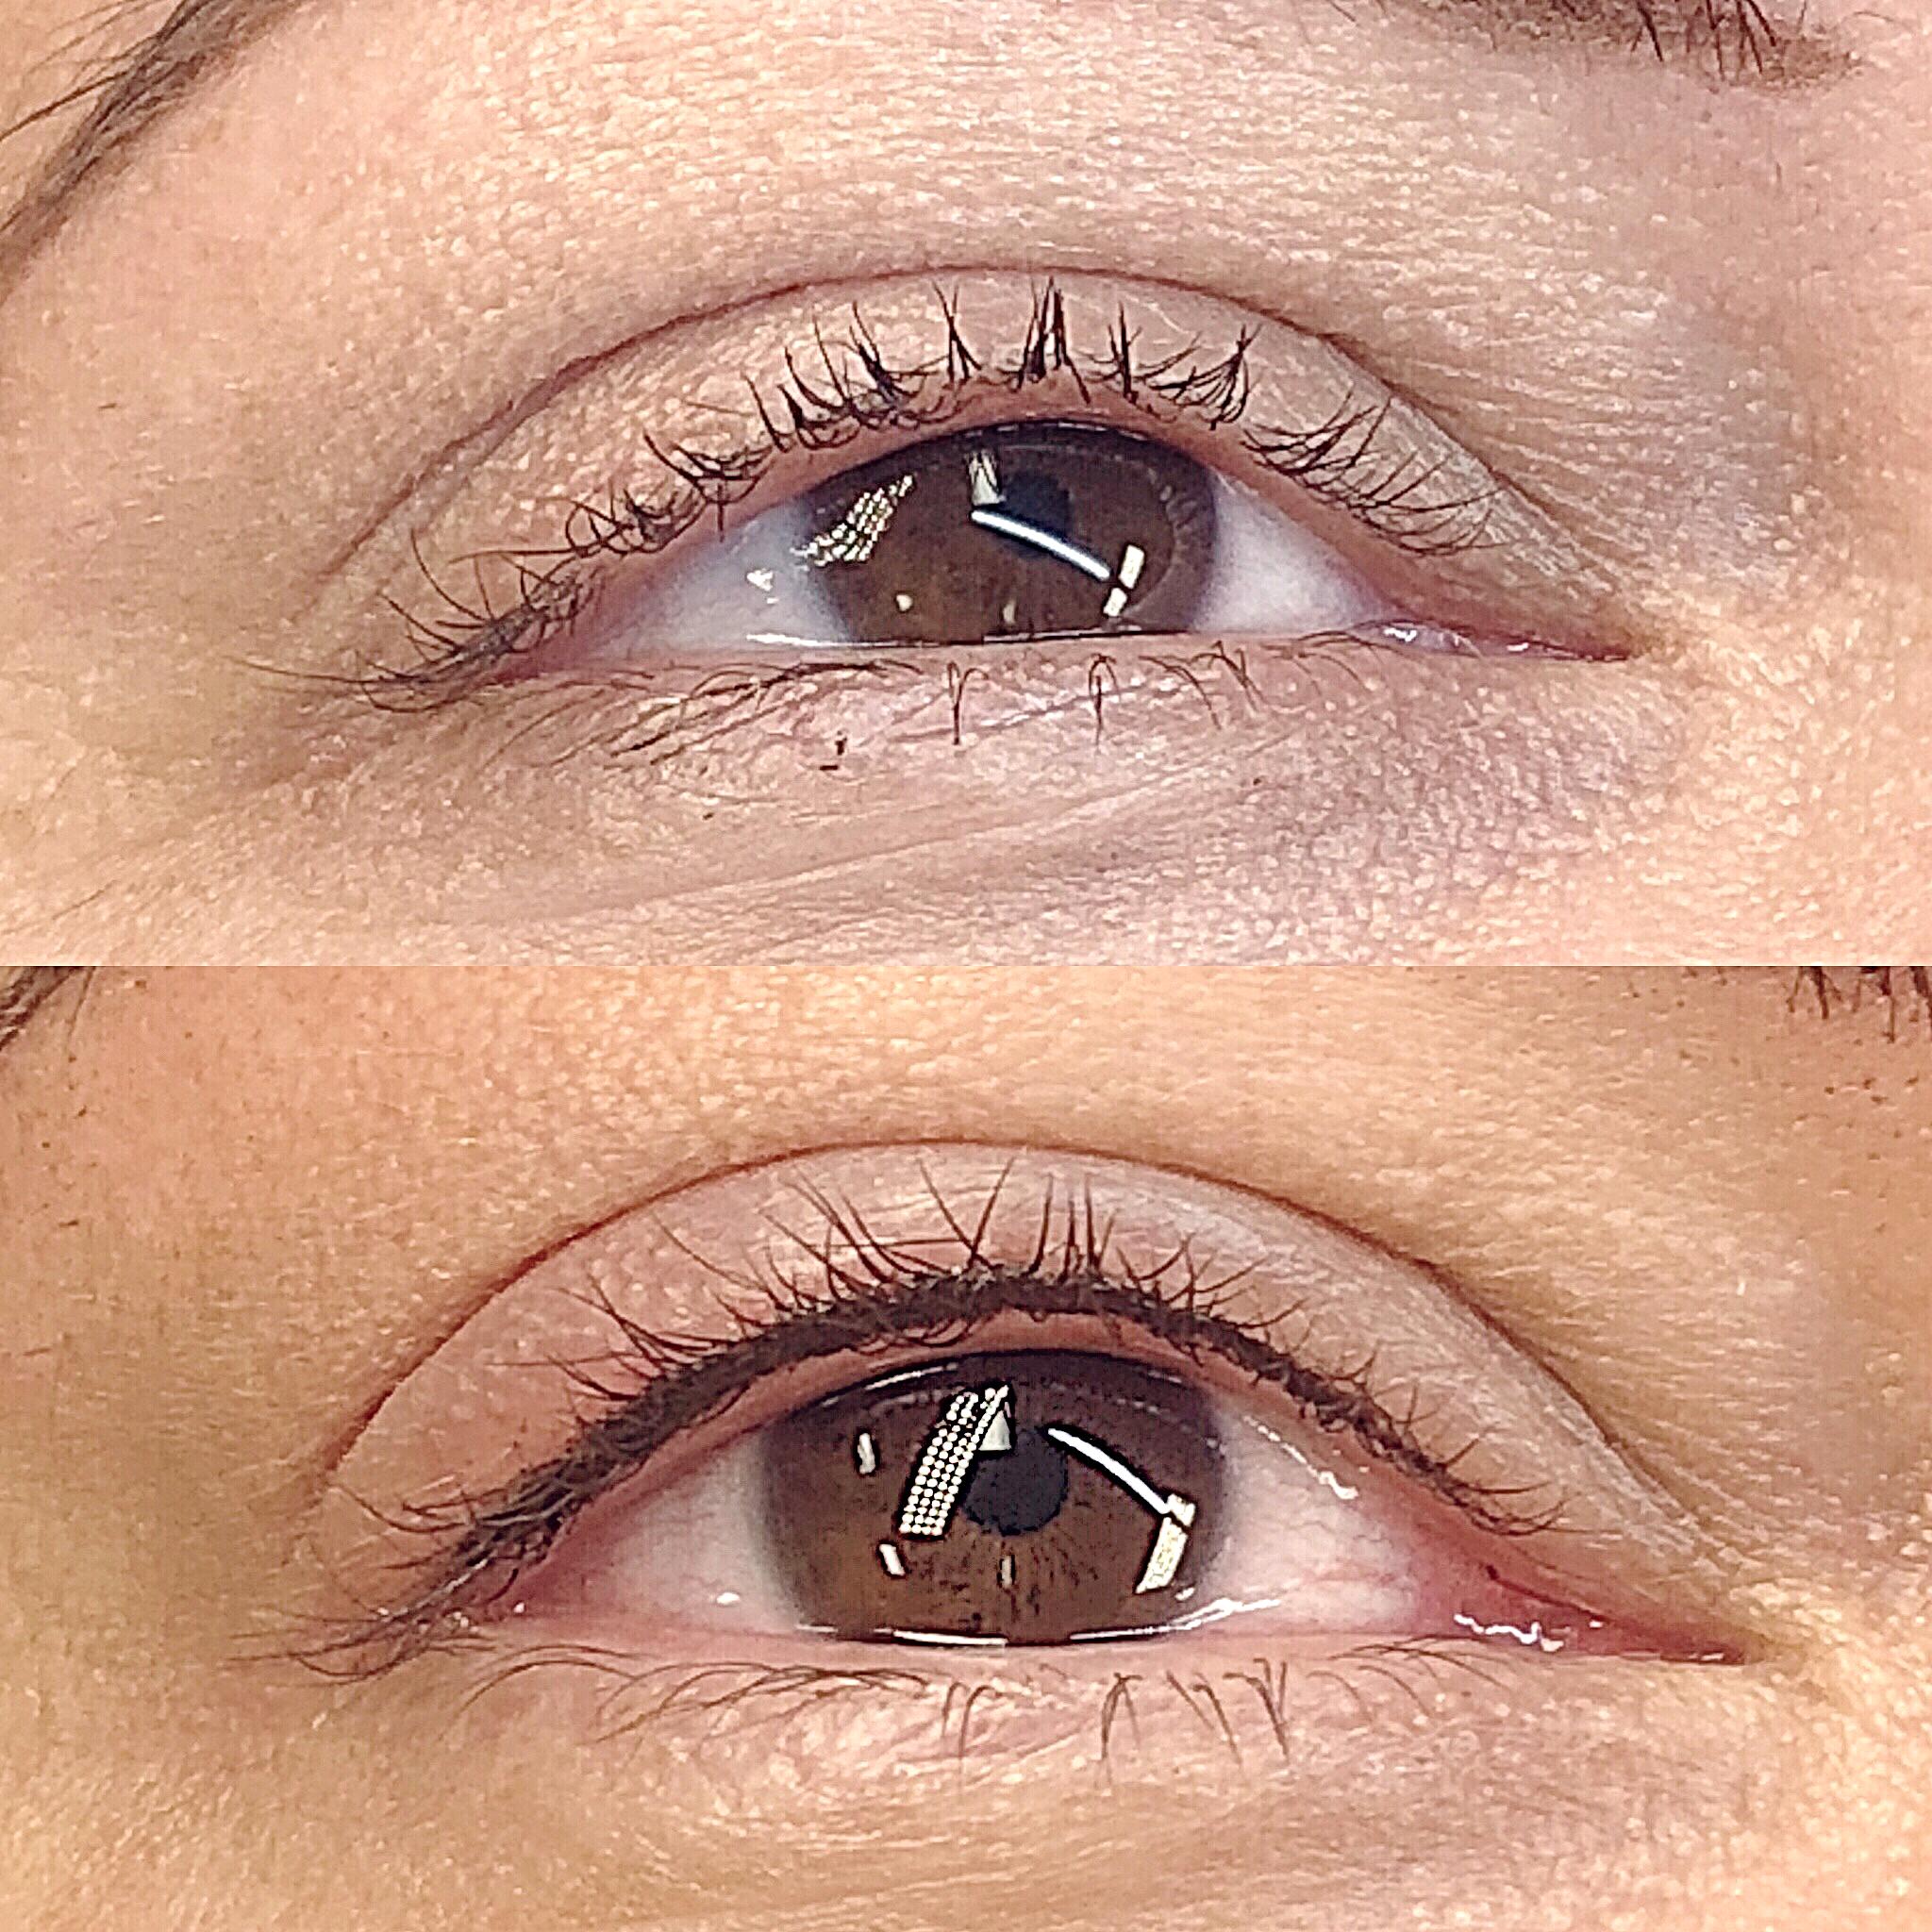 Eyelash line enchantment.